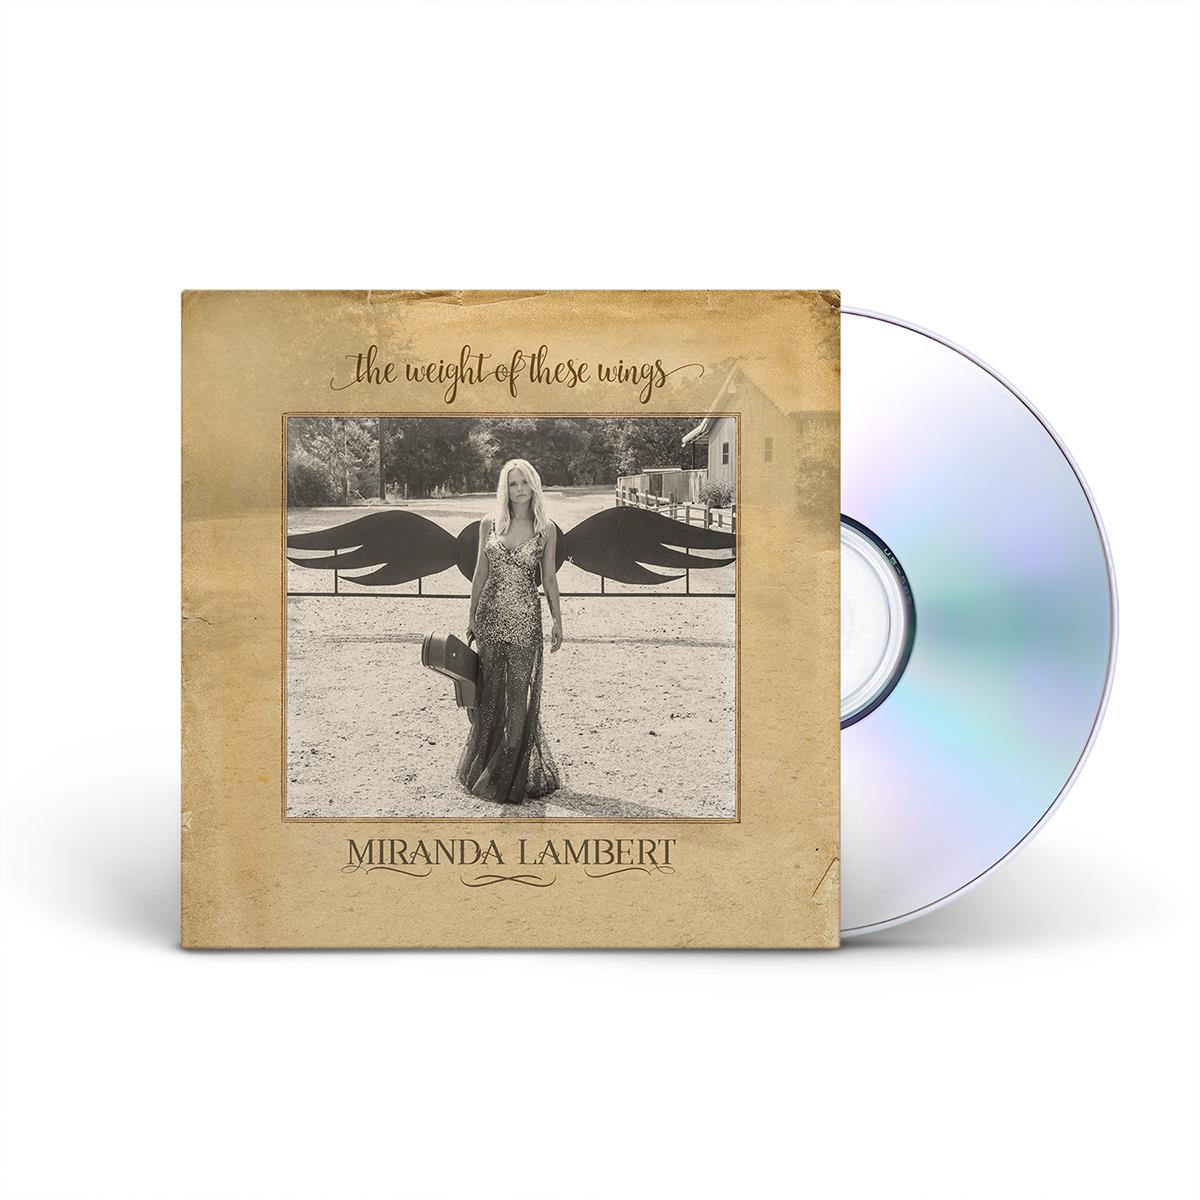 Miranda lambert the weight of these wings cd shop the for Miranda lambert the weight of these wings songs